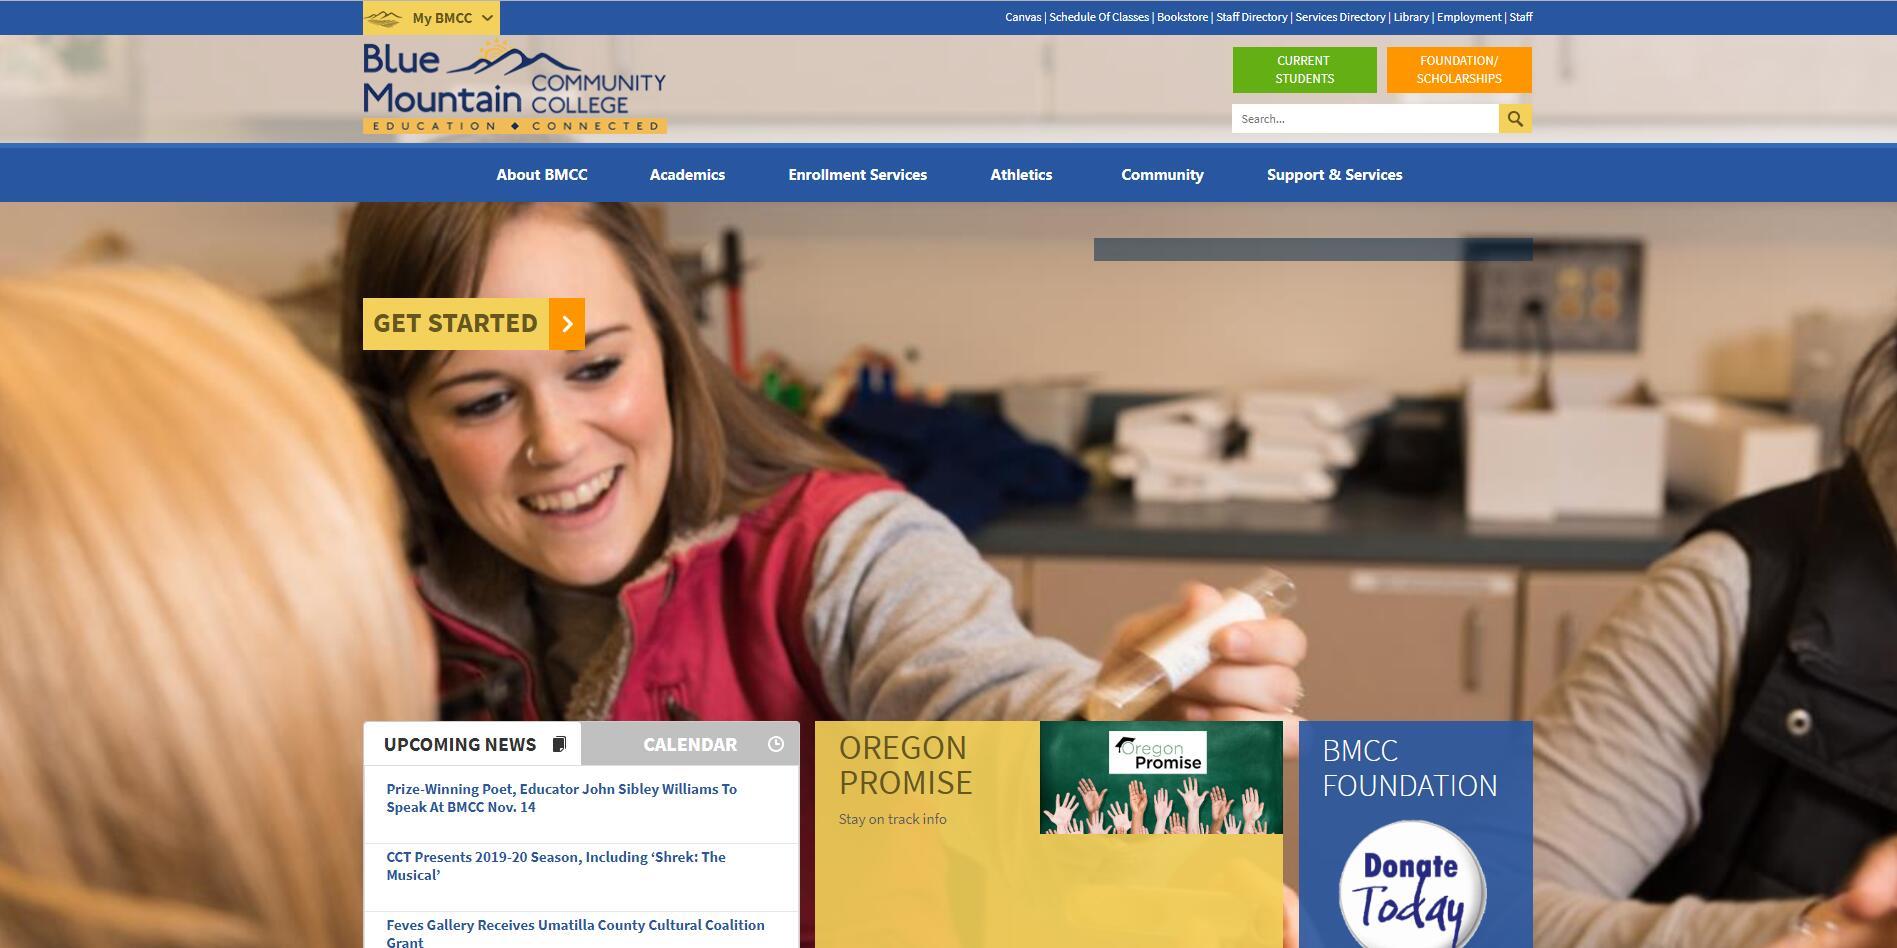 Blue Mountain Community College